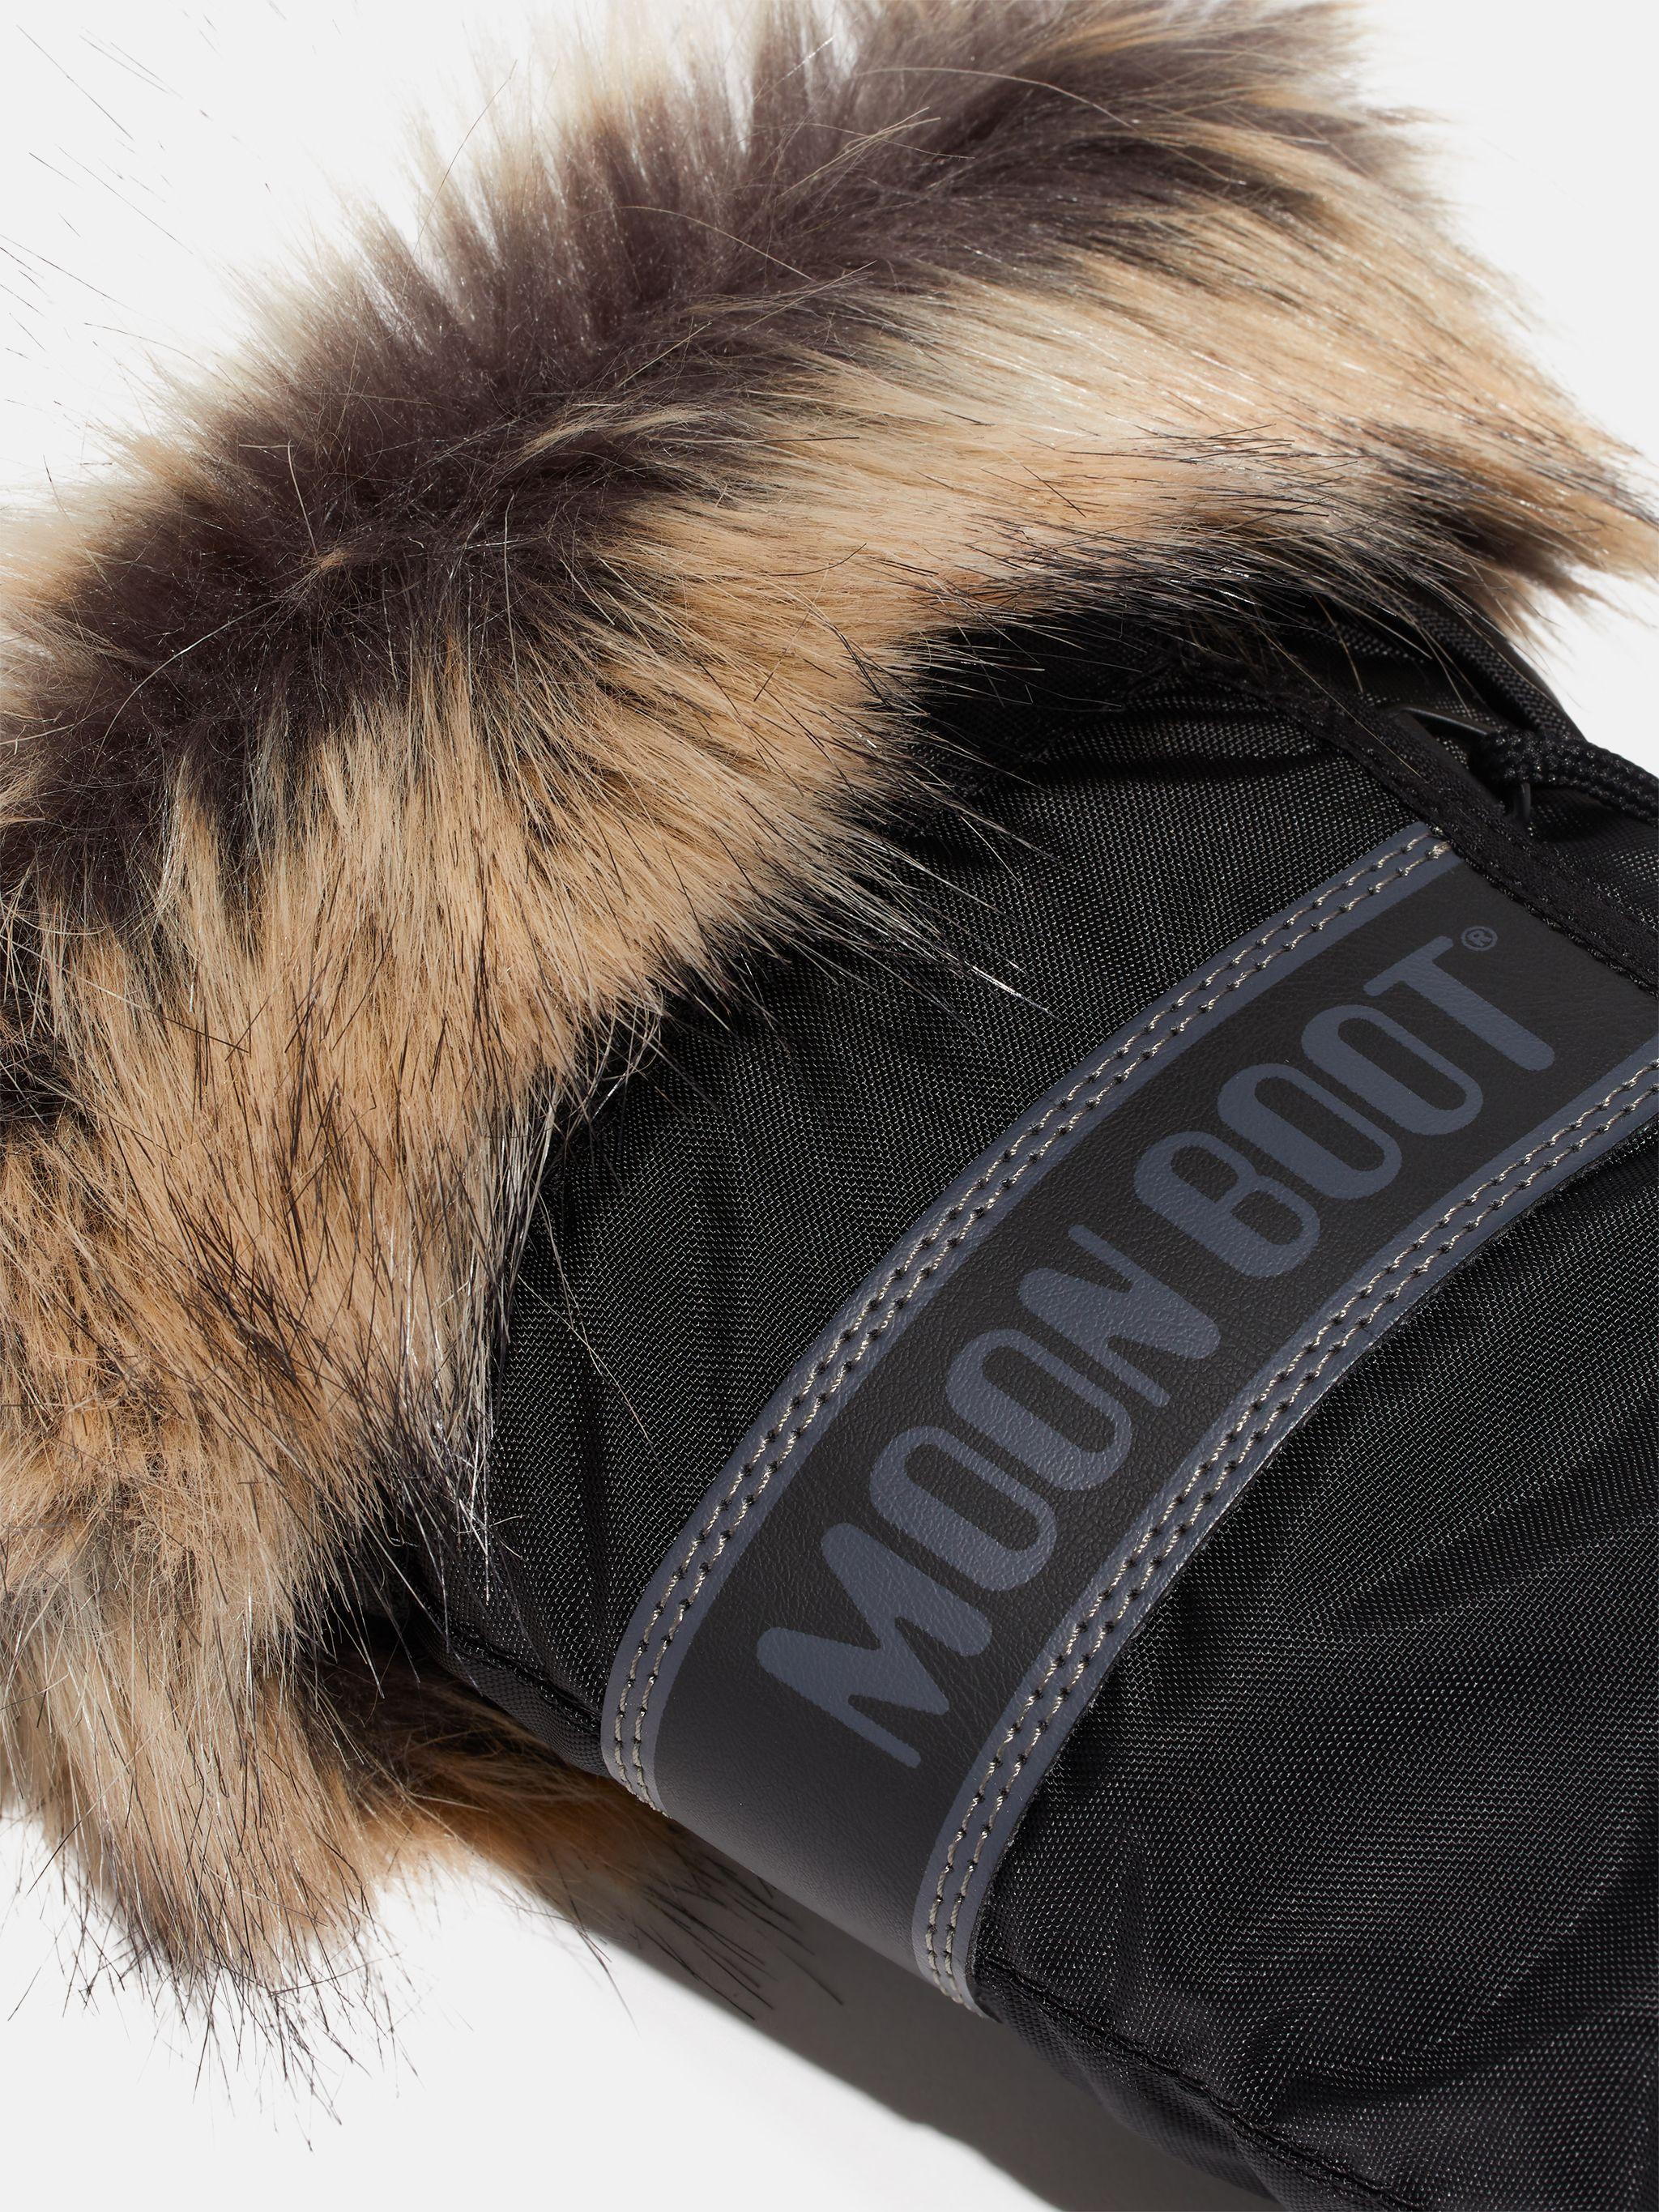 BOTTES PROTECHT HI-TOP MONACO BLACK